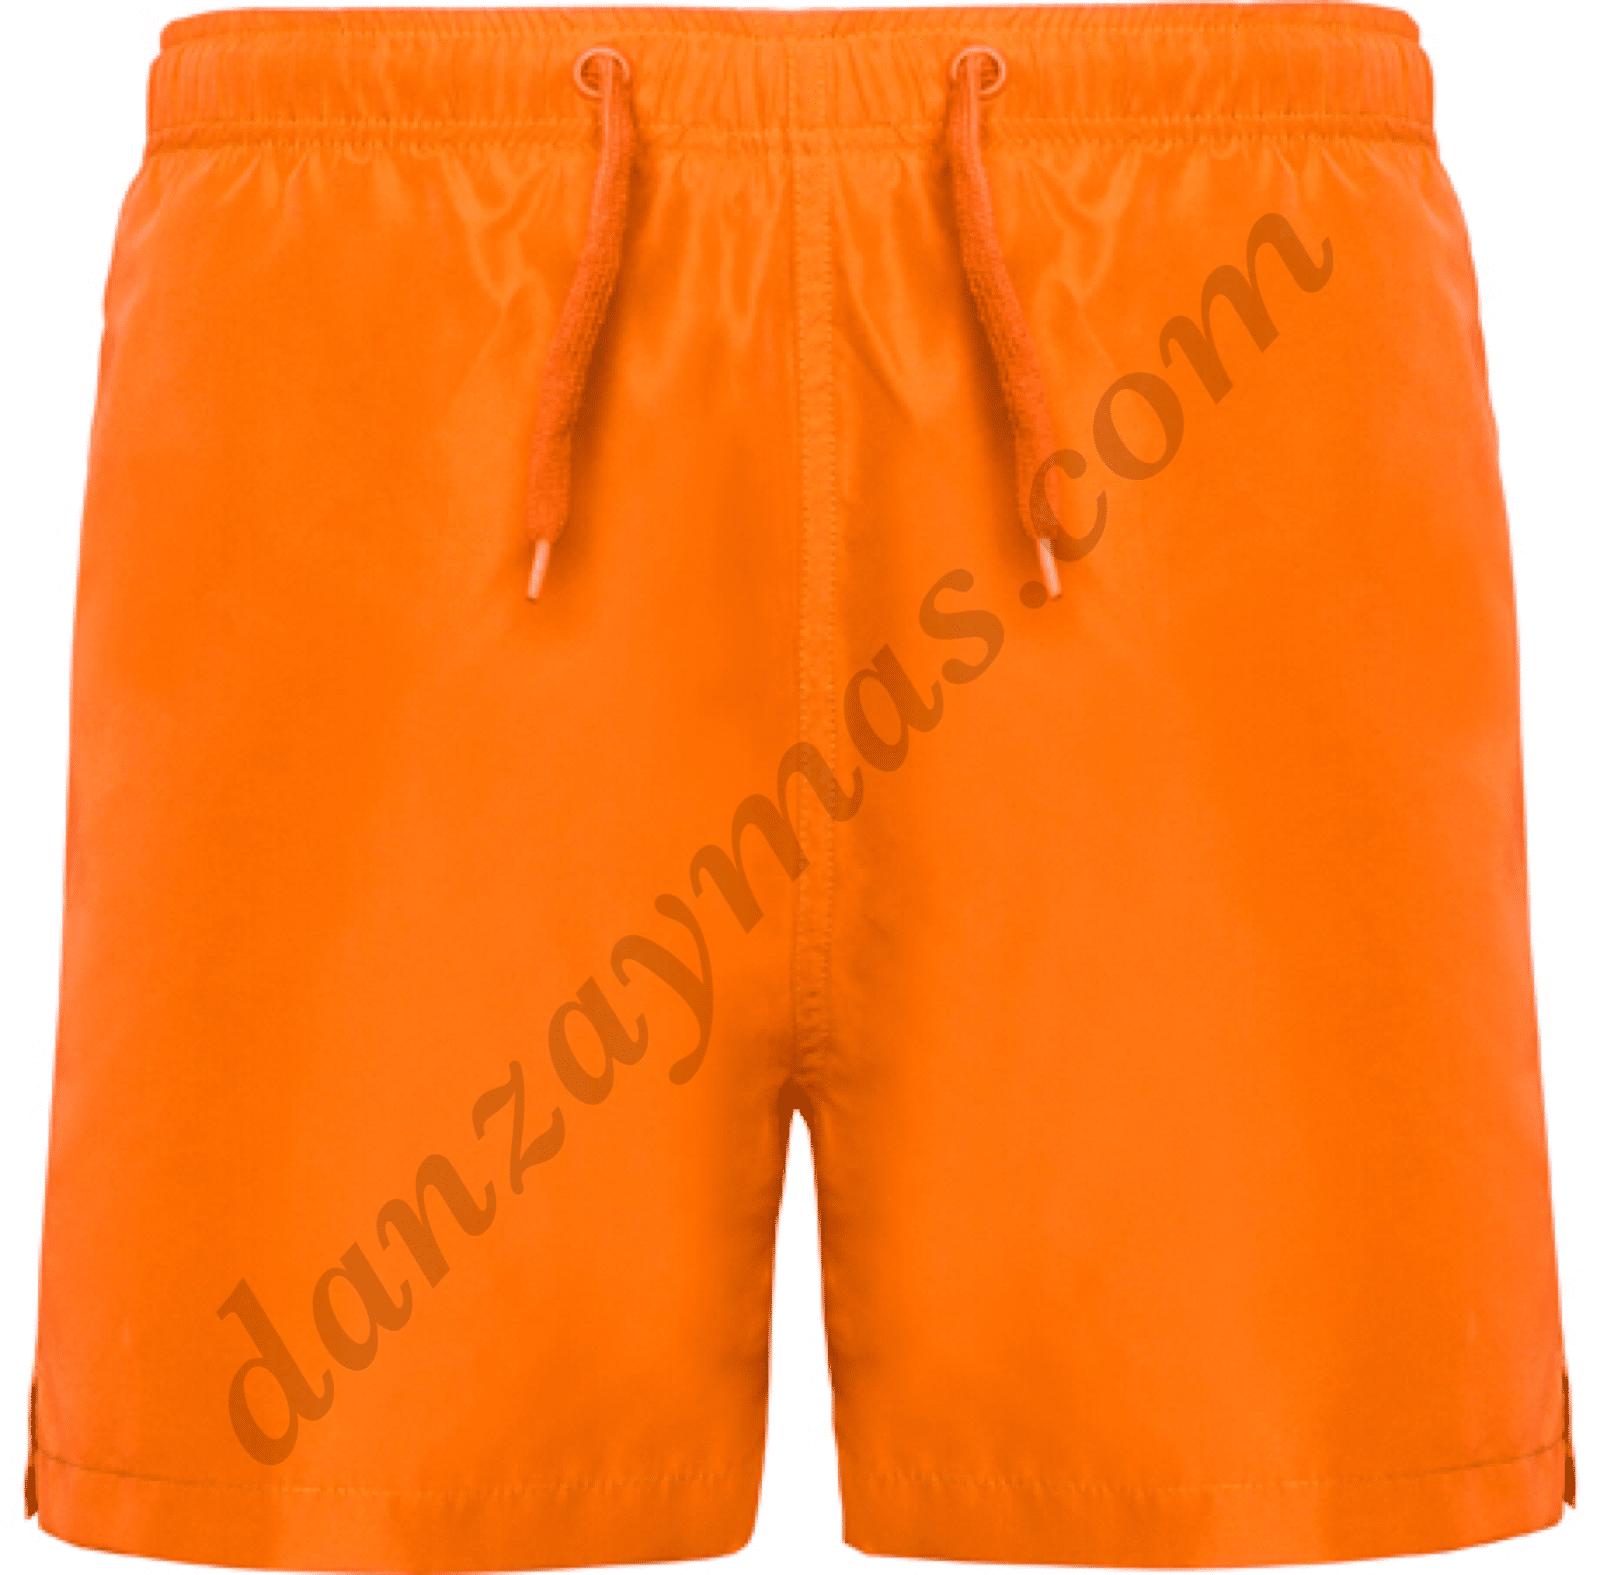 Bañador niño en naranja flúor